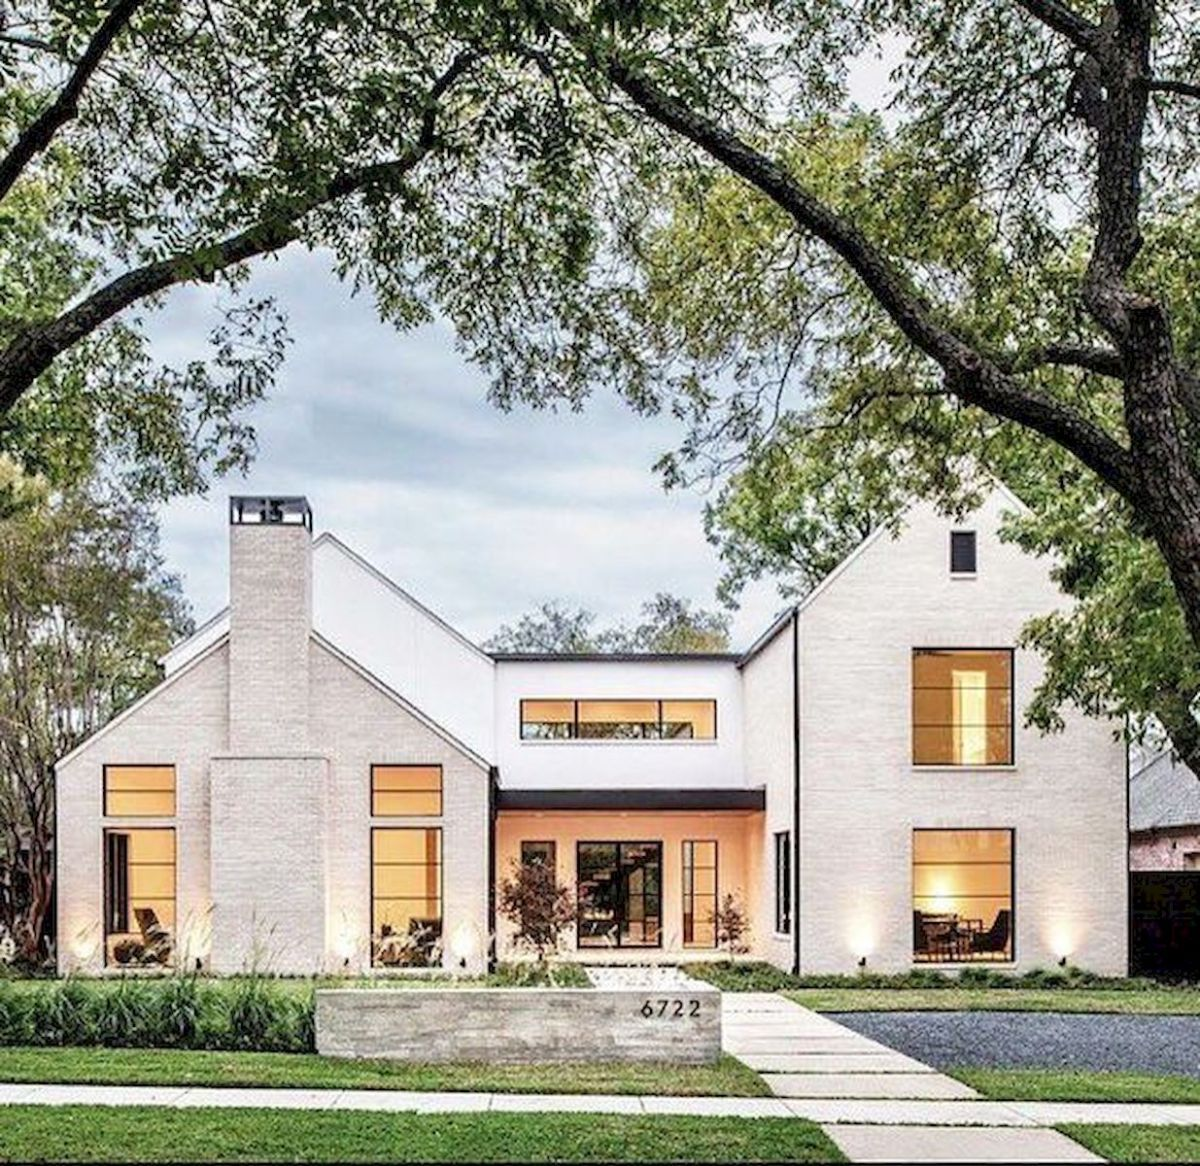 33 beautiful modern farmhouse exterior design ideas 1 on beautiful modern farmhouse trending exterior design ideas id=66356